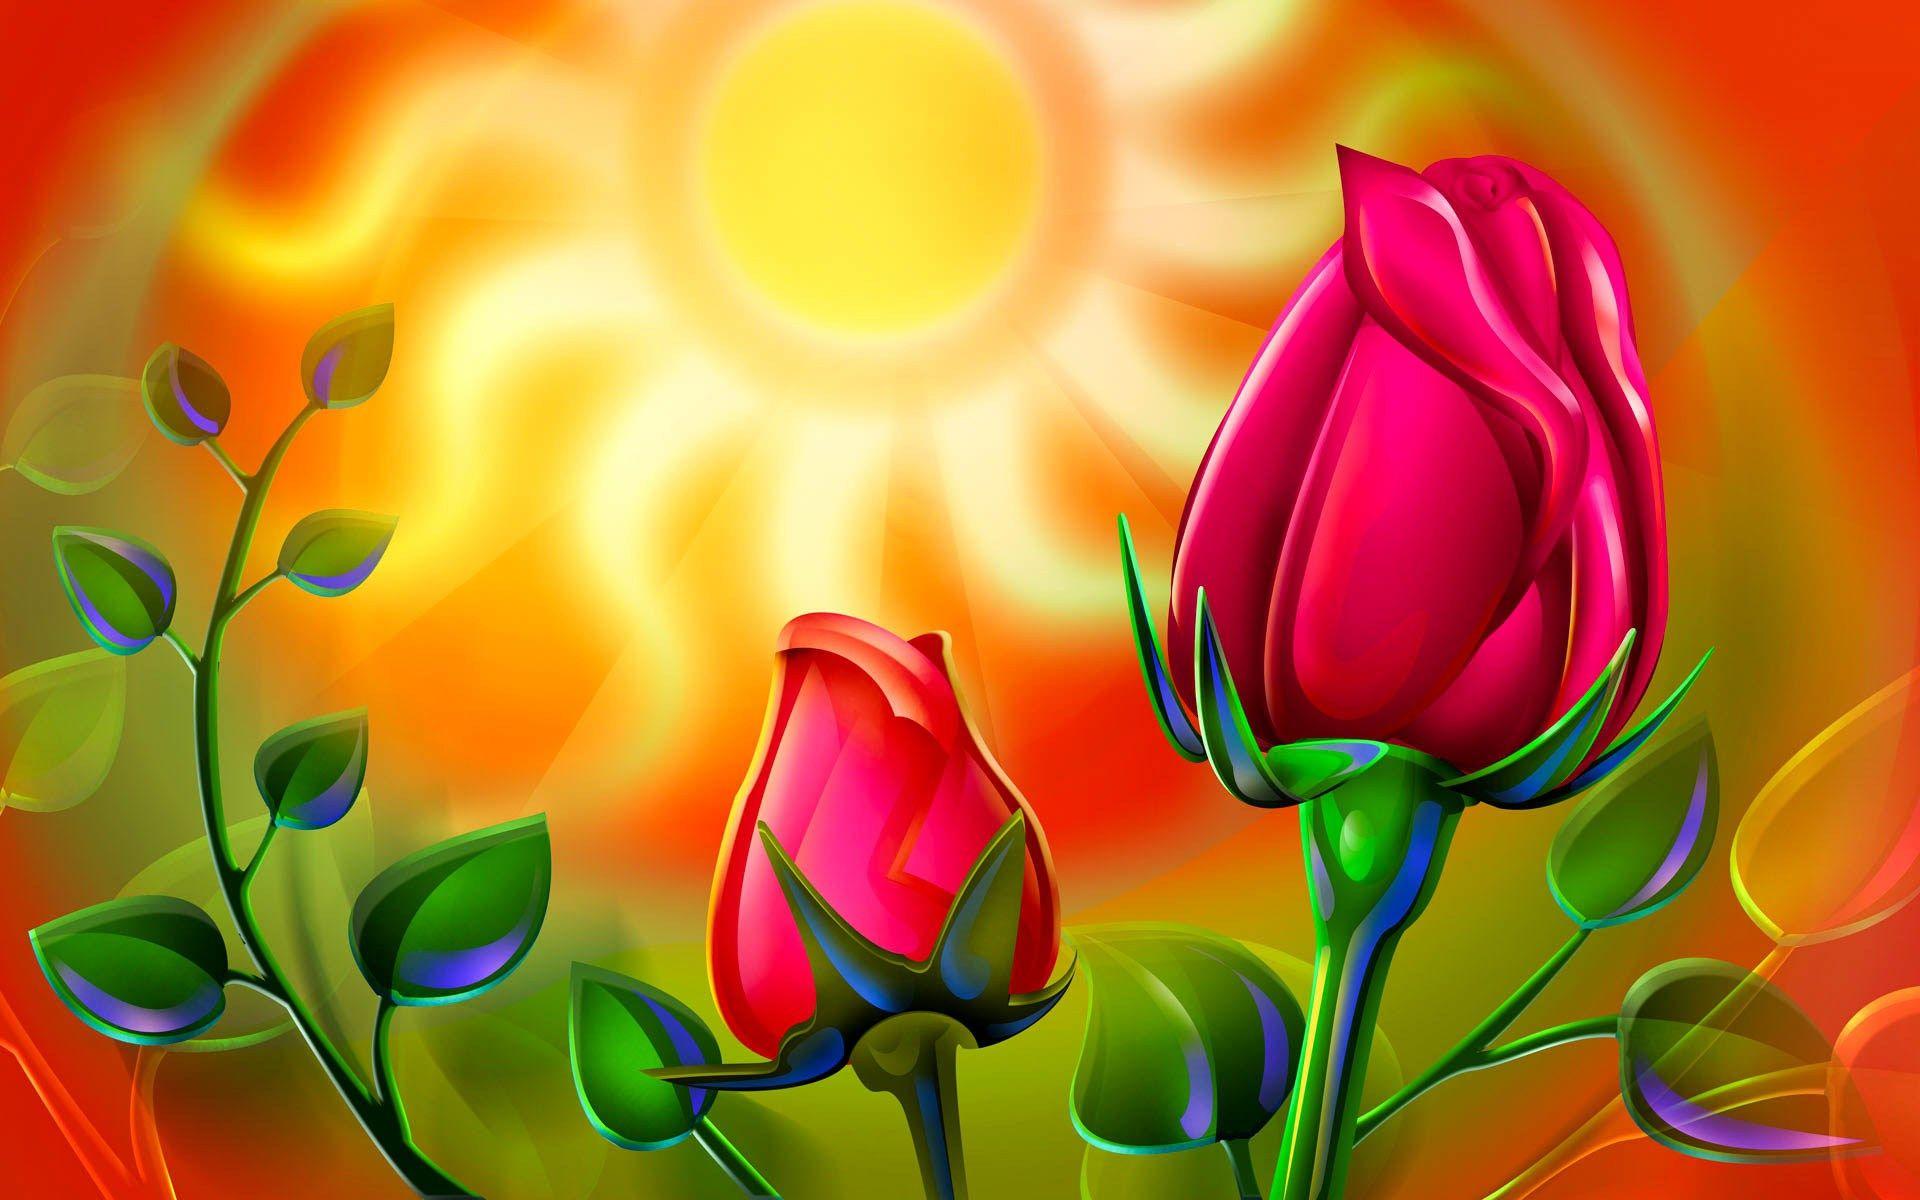 Beautiful flowers wallpapers hd wallpapers prabhas pinterest beautiful flowers wallpapers hd wallpapers izmirmasajfo